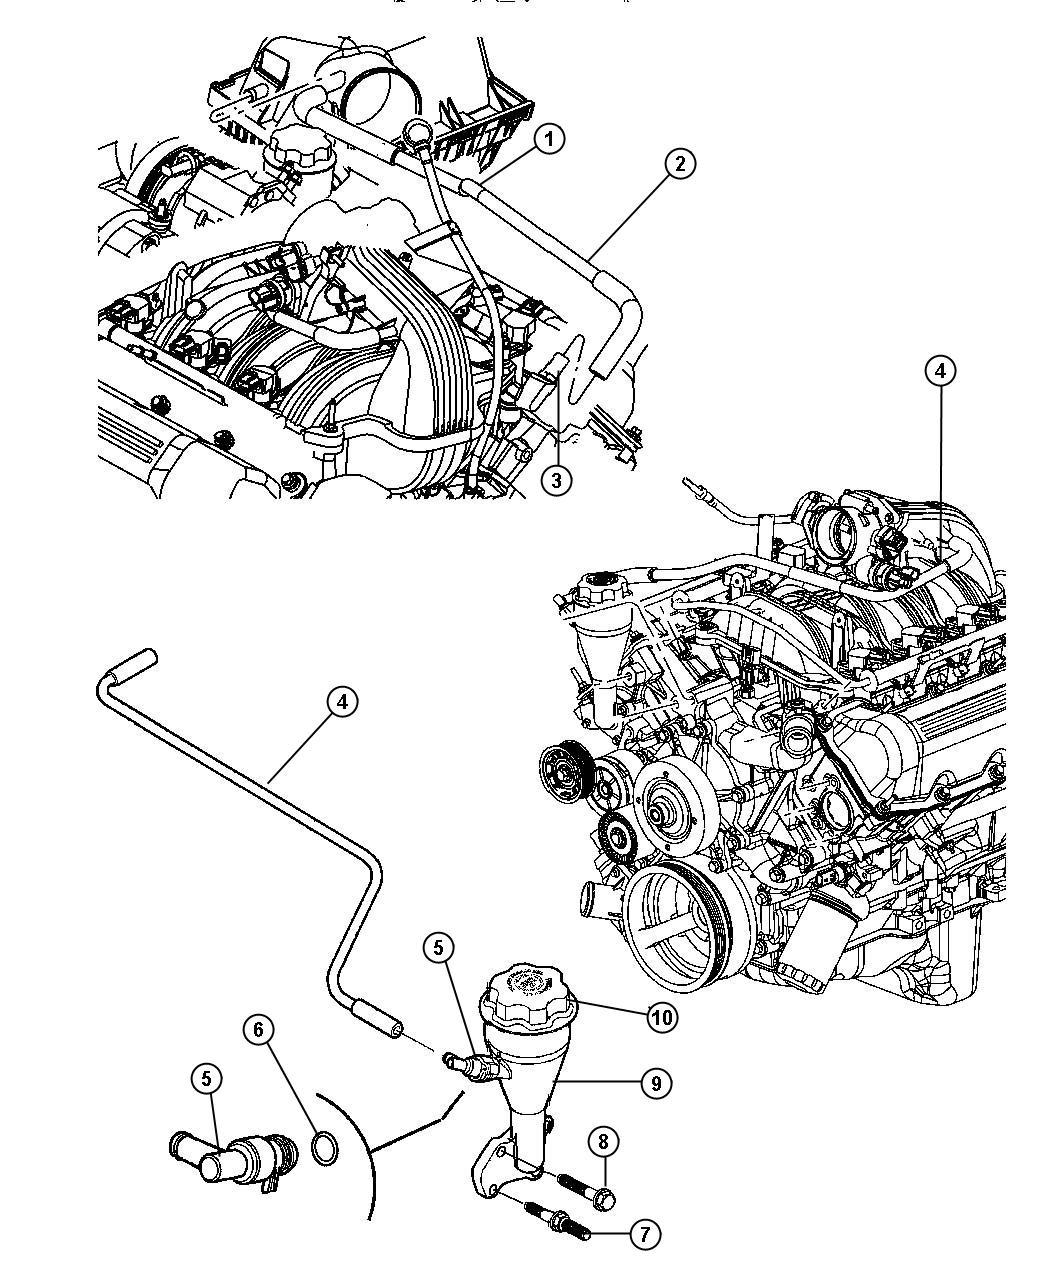 Chrysler Crankcase Ventilation 3 7l 3 7l V6 Engine